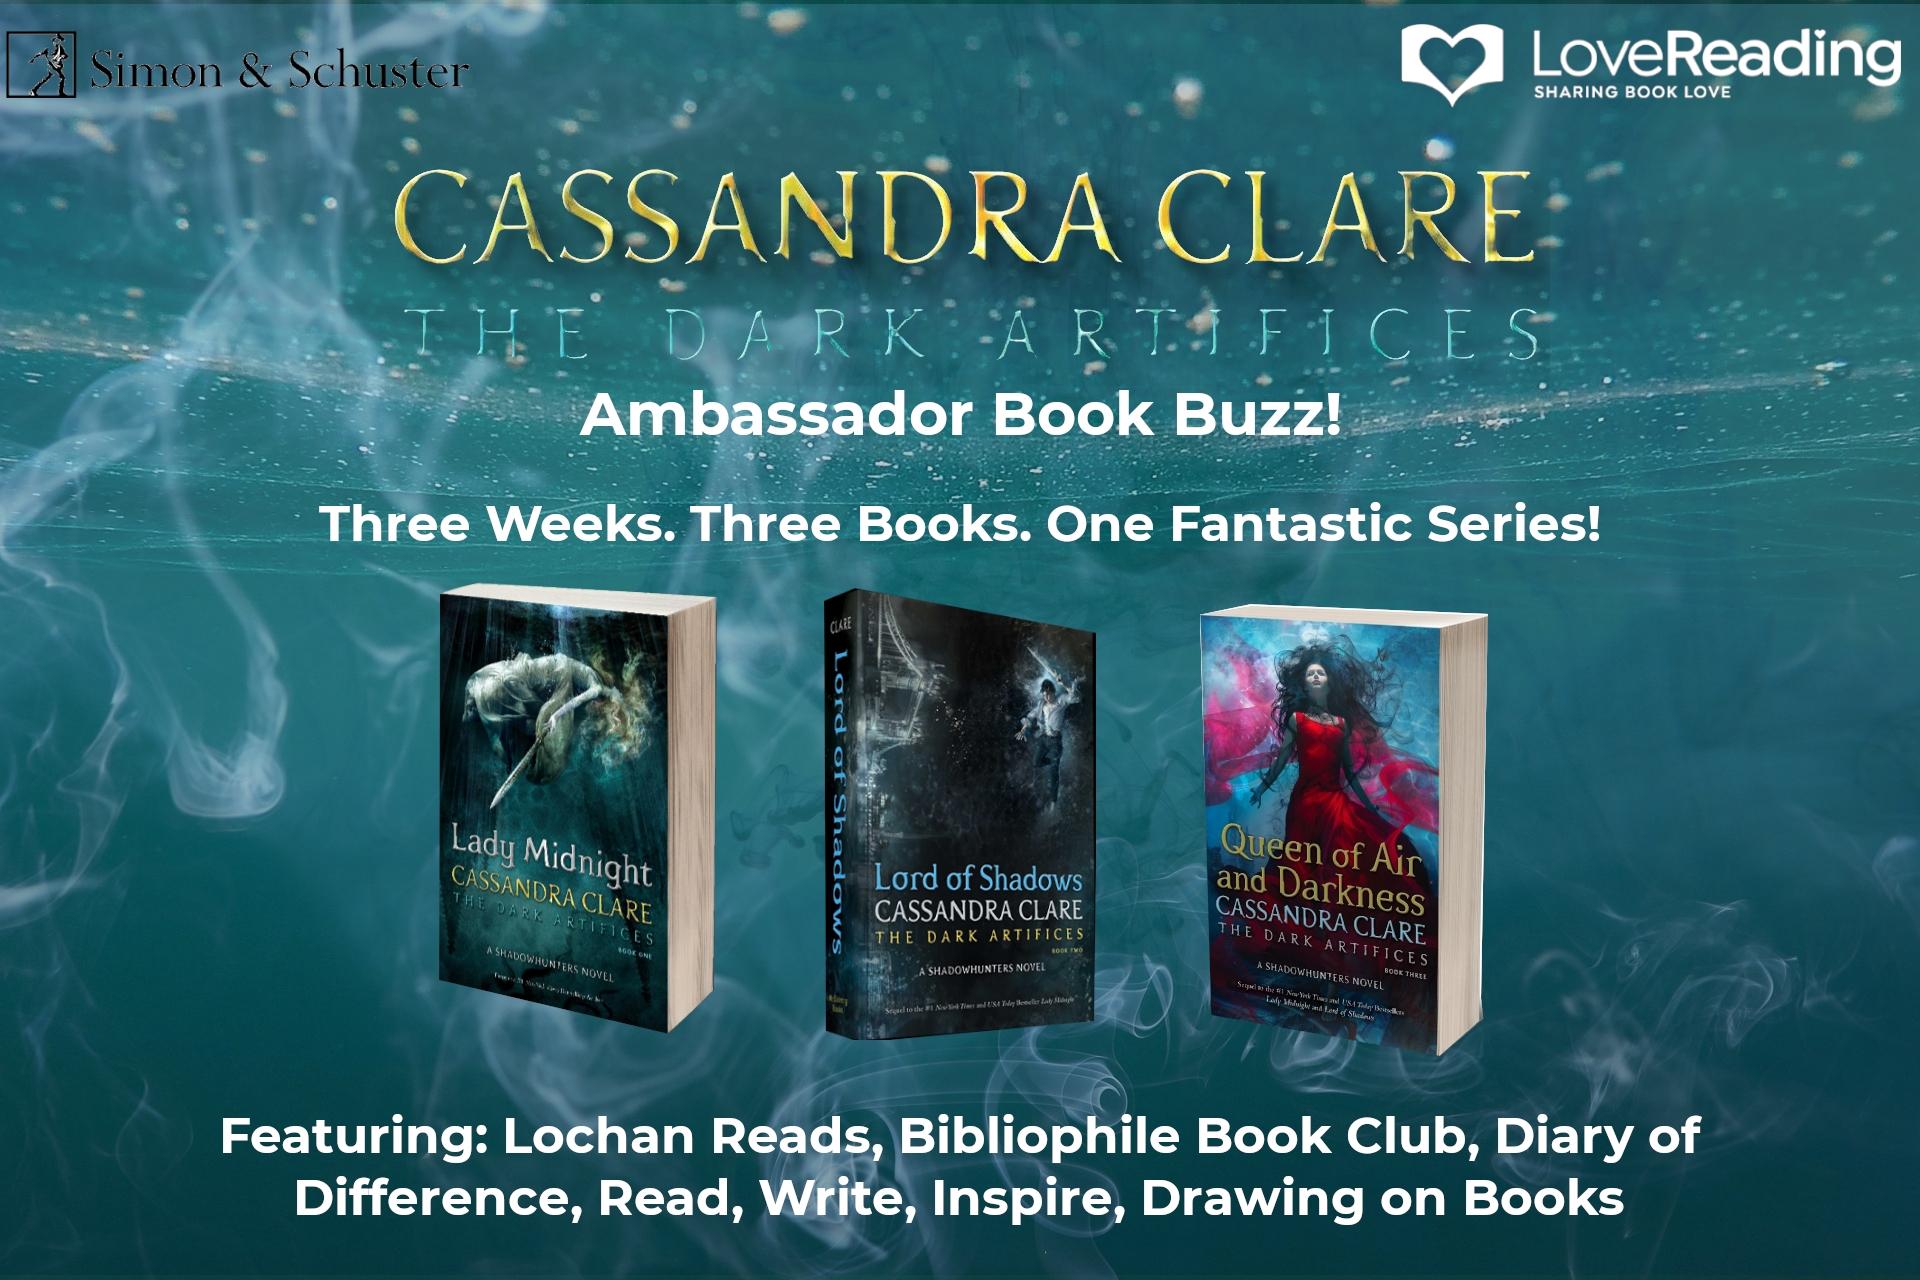 Ambassador Book Buzz: The Dark Artifices by Cassandra Clare